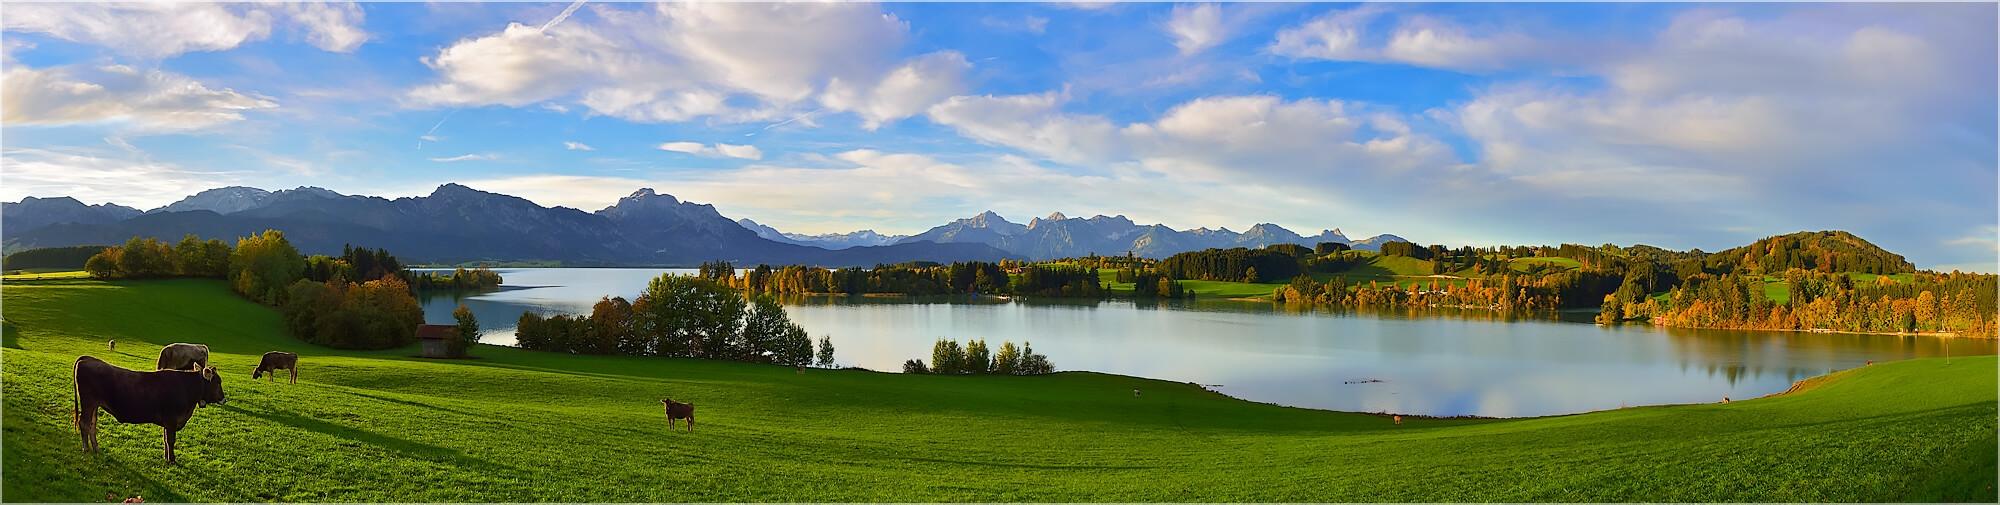 Panoramabild Morgens am Forggensee im Allgäu